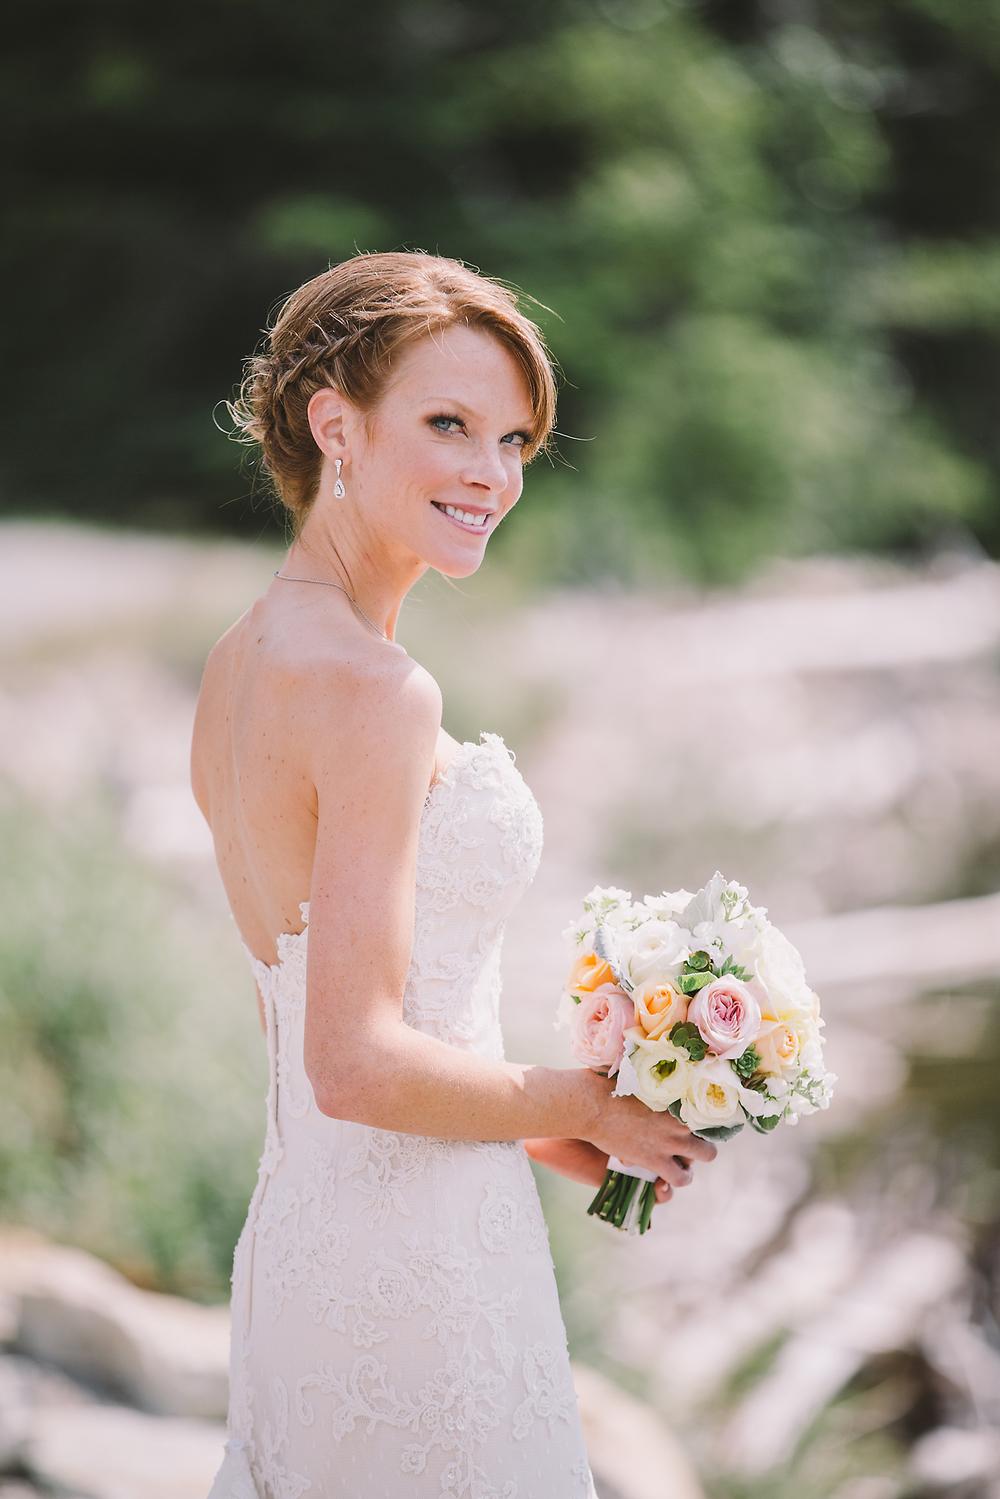 brett-birdsong-photography-082814-bride.jpg